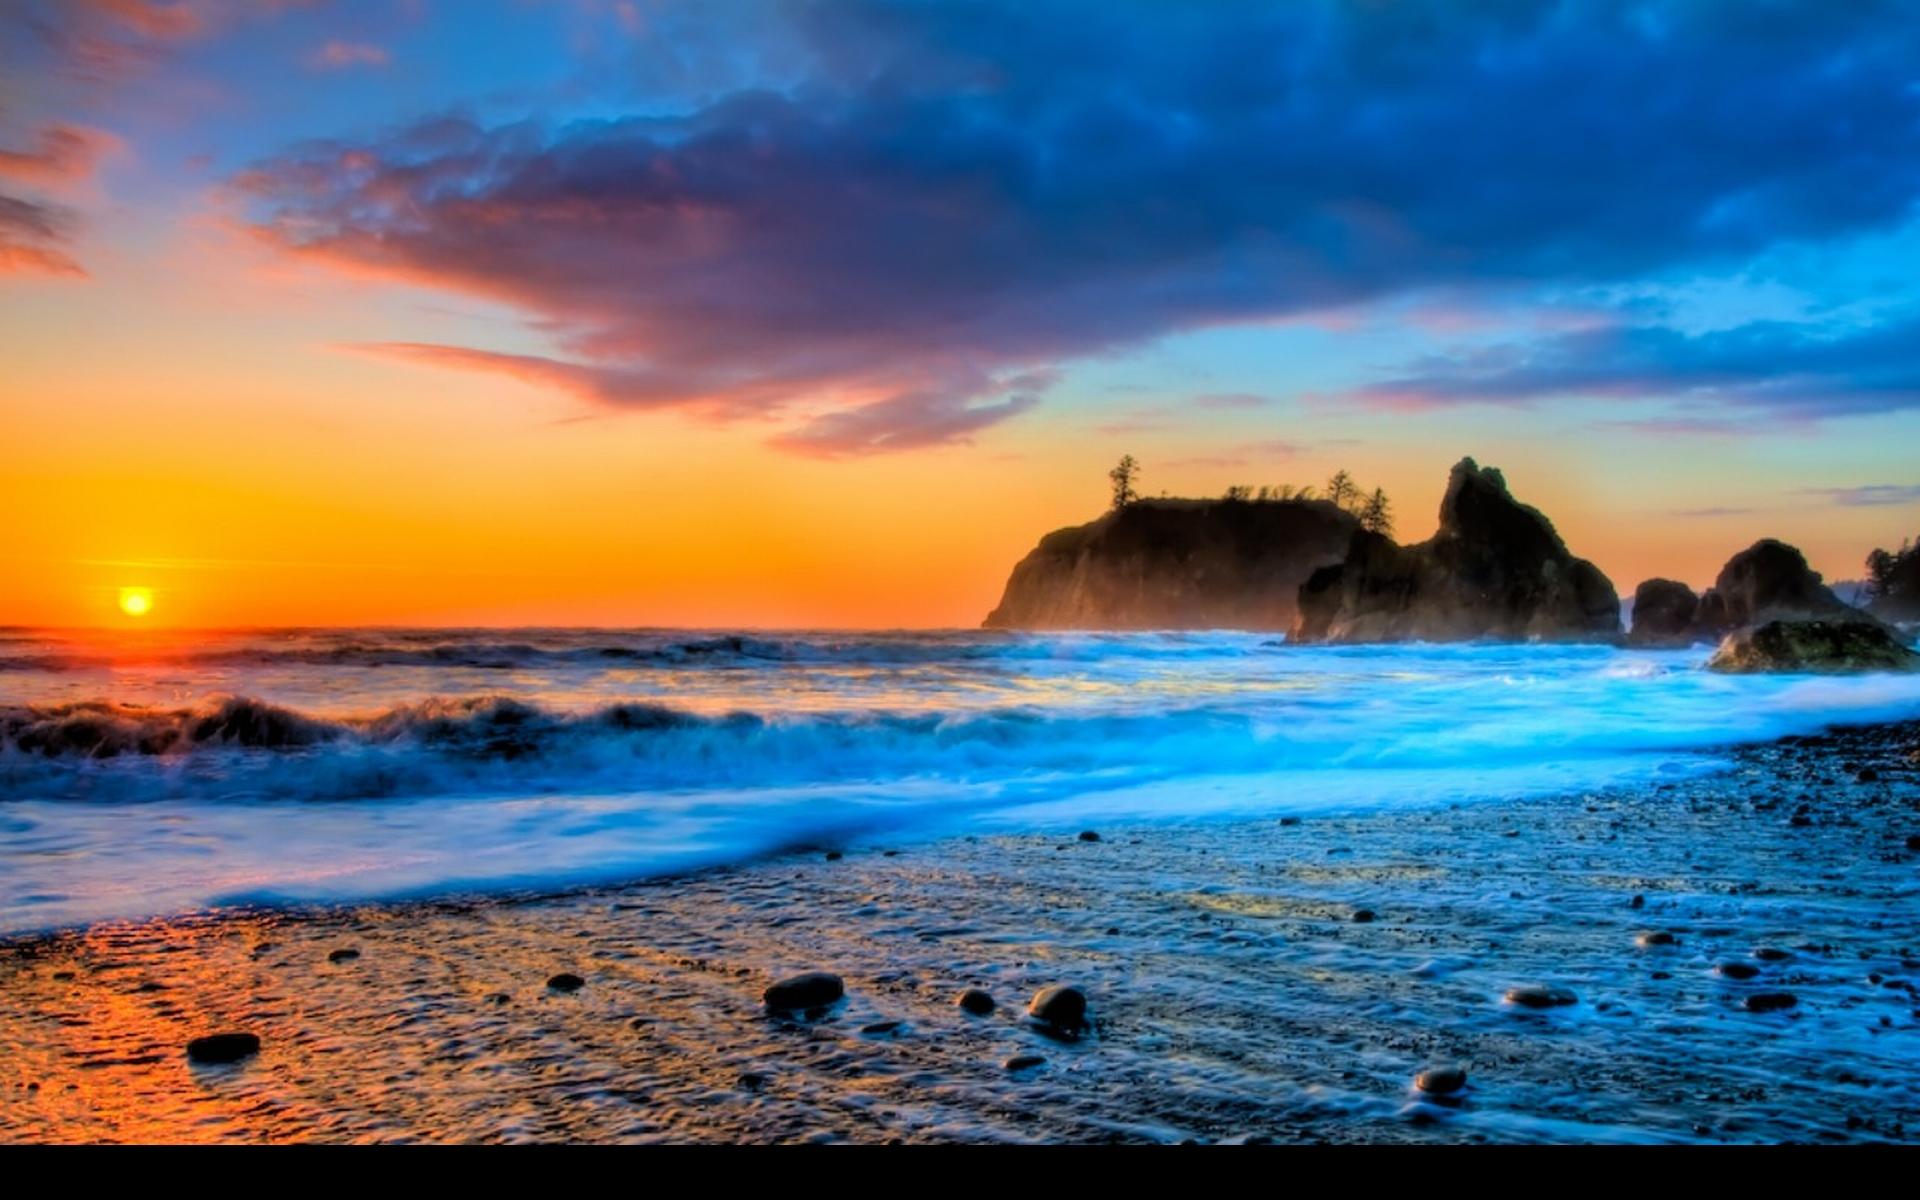 Ruby beach sunset hd wallpaper beach background wallpaper for pc cool 1920x1200